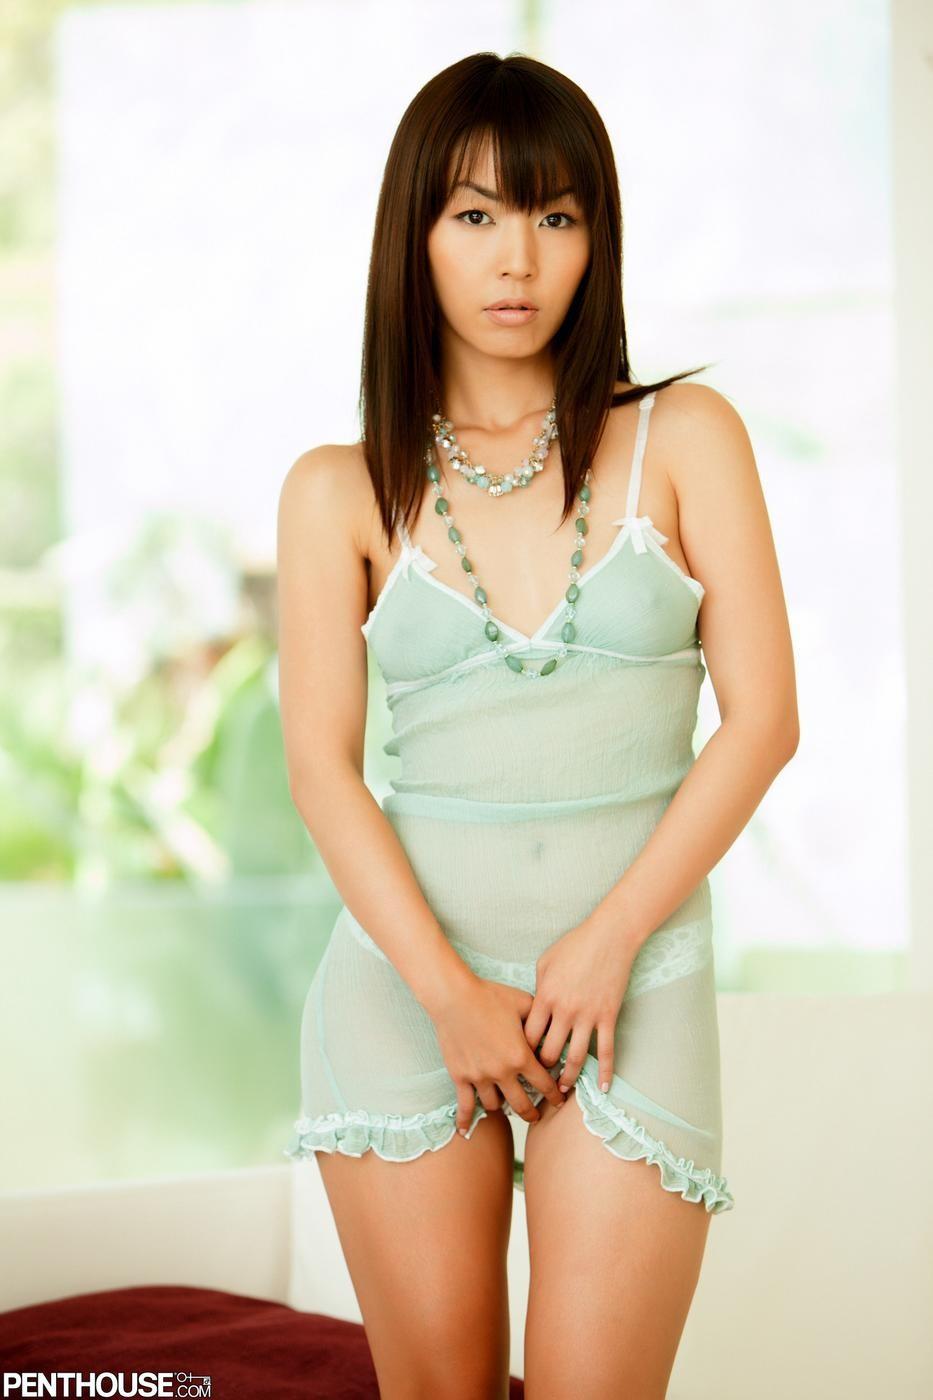 Marica Haze